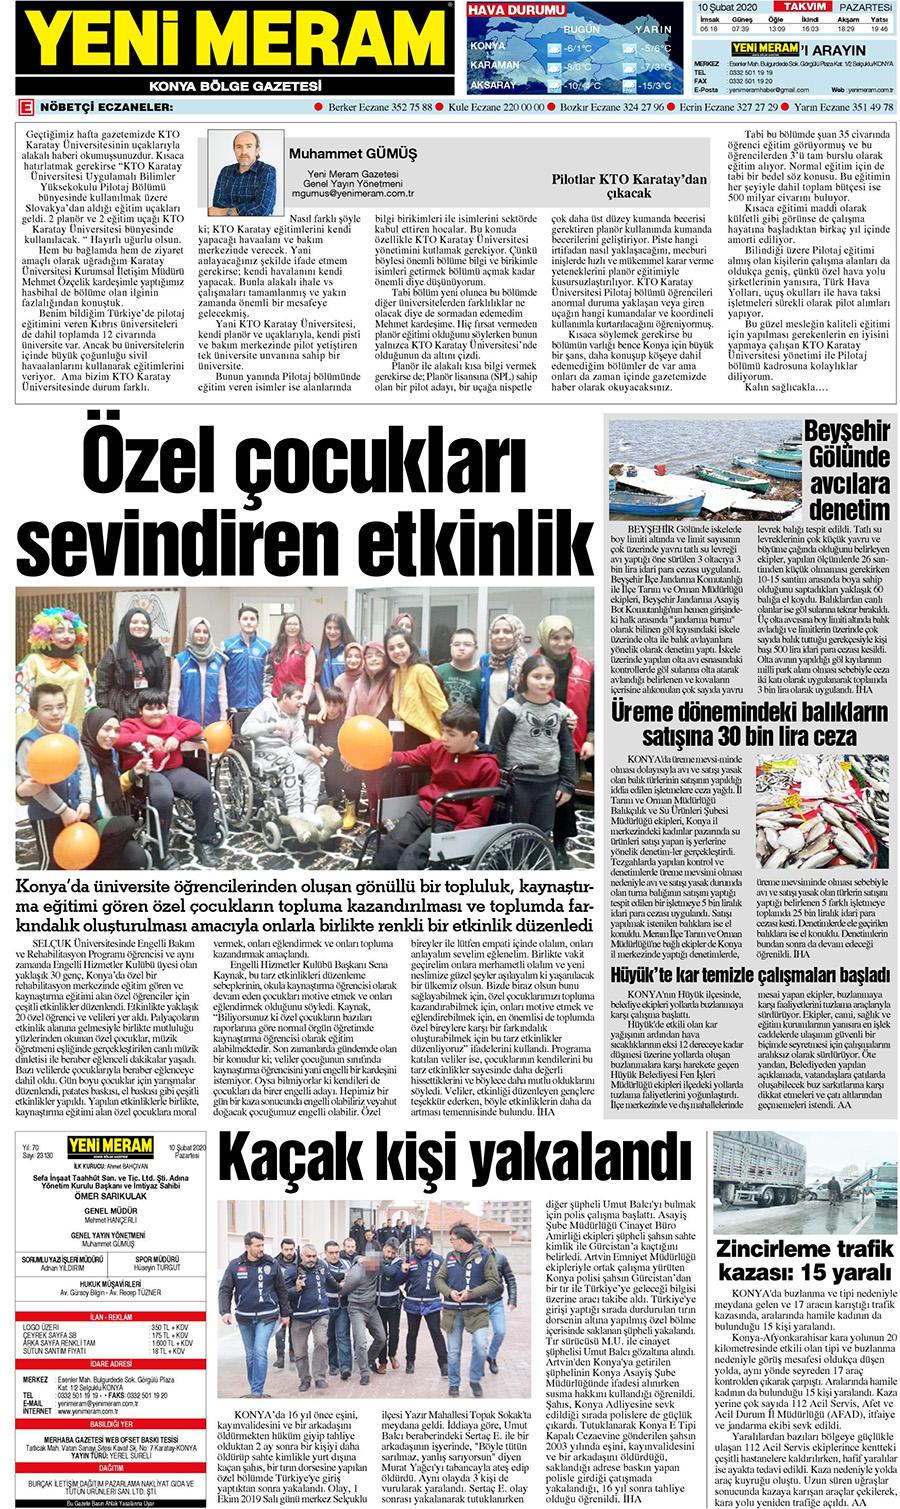 10 Subat 2020 Yeni Meram Gazetesi Sayfa 3 12 Yeni Meram